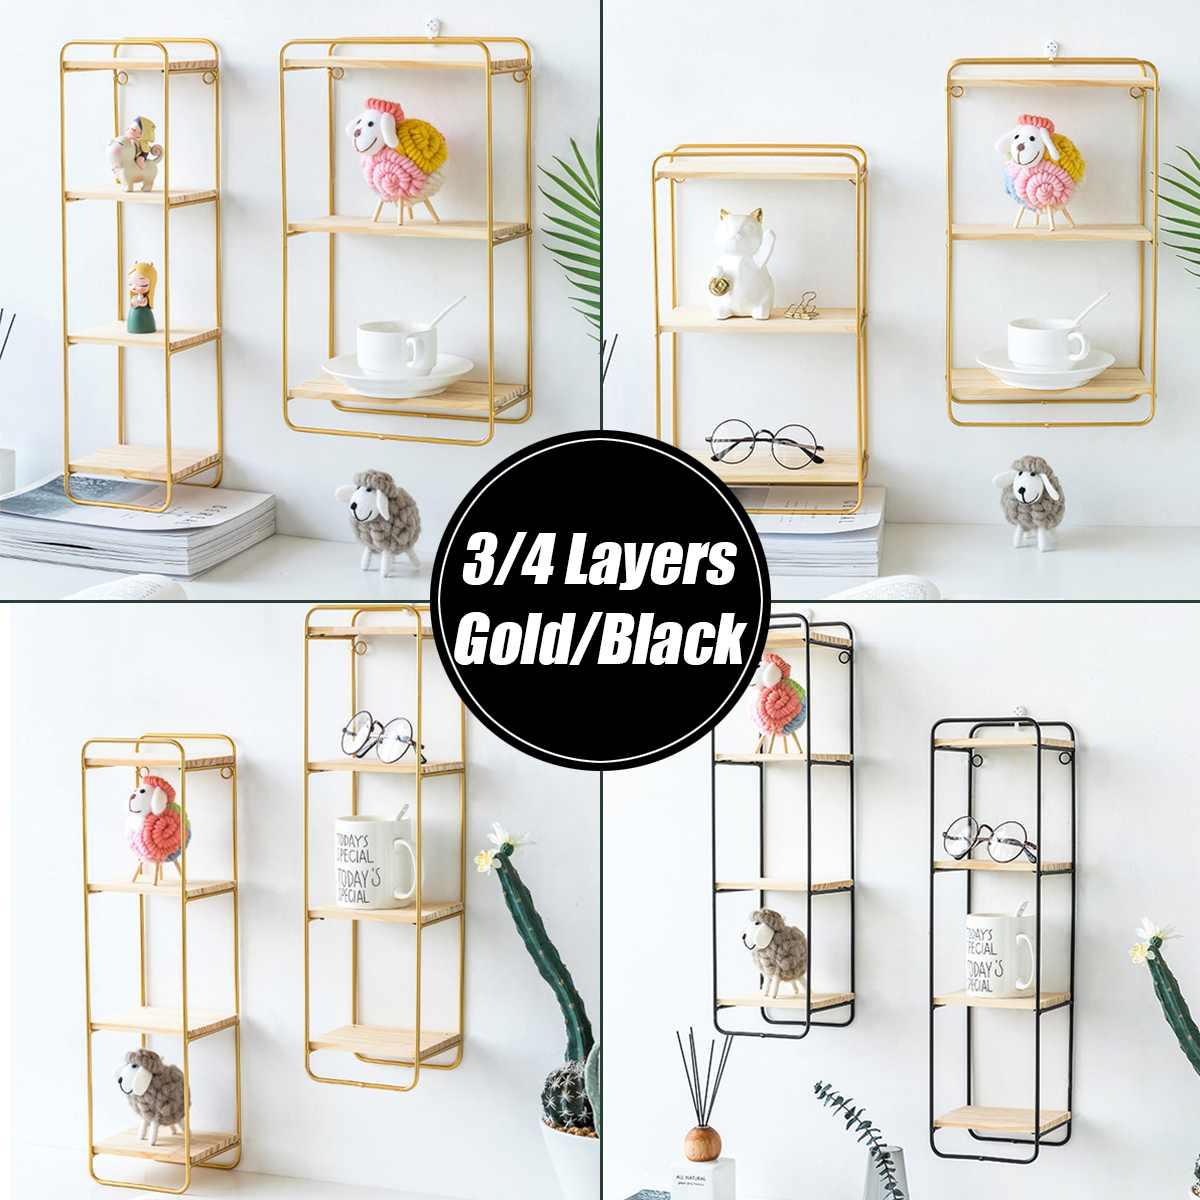 3/4 Layers Nordic Iron Rectangular Grid Wall Storage Rack Shelf Wall Hanging Geometric Figure Display Crafts Decorative Shelves